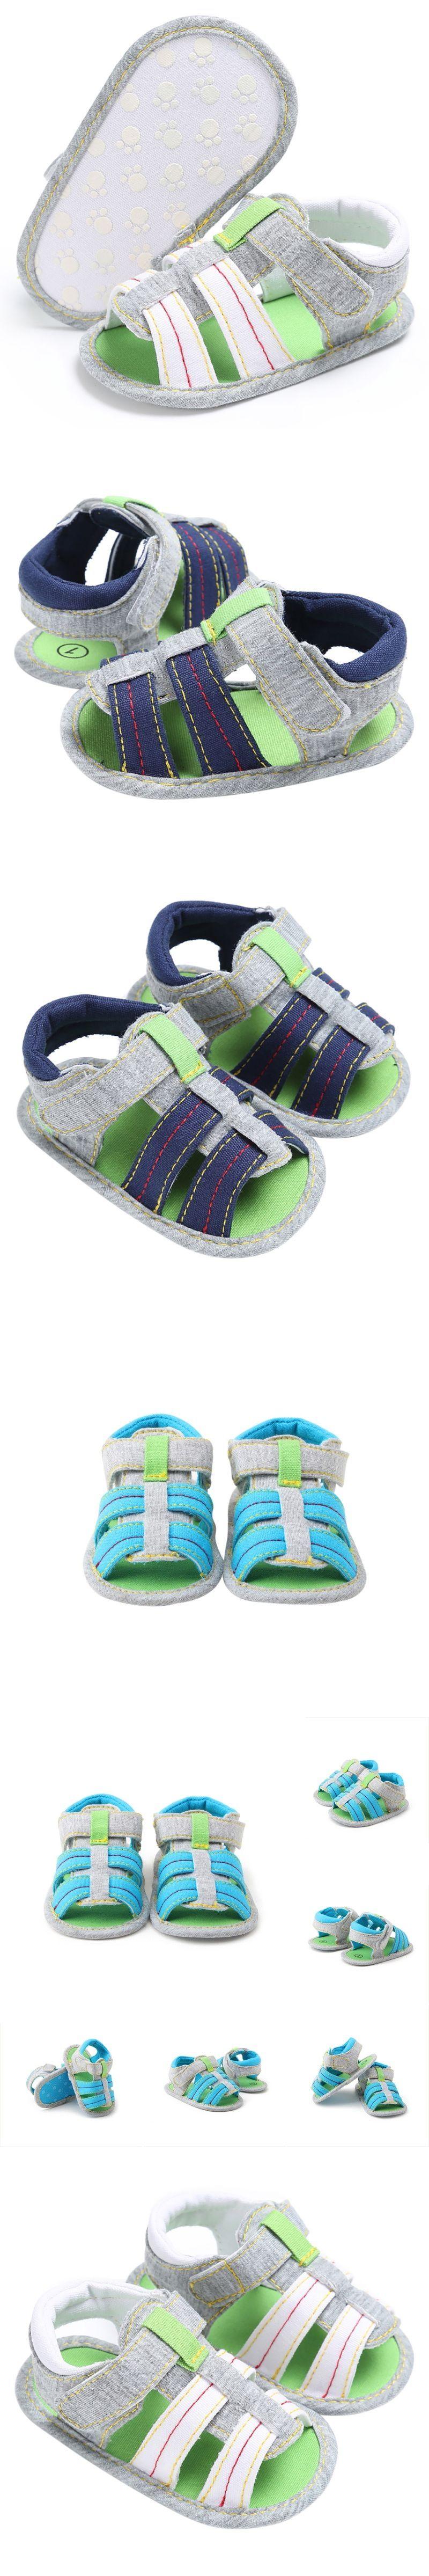 2017 Summer Baby Leisure Prewalker Soft Sole Striped Beach Shoes